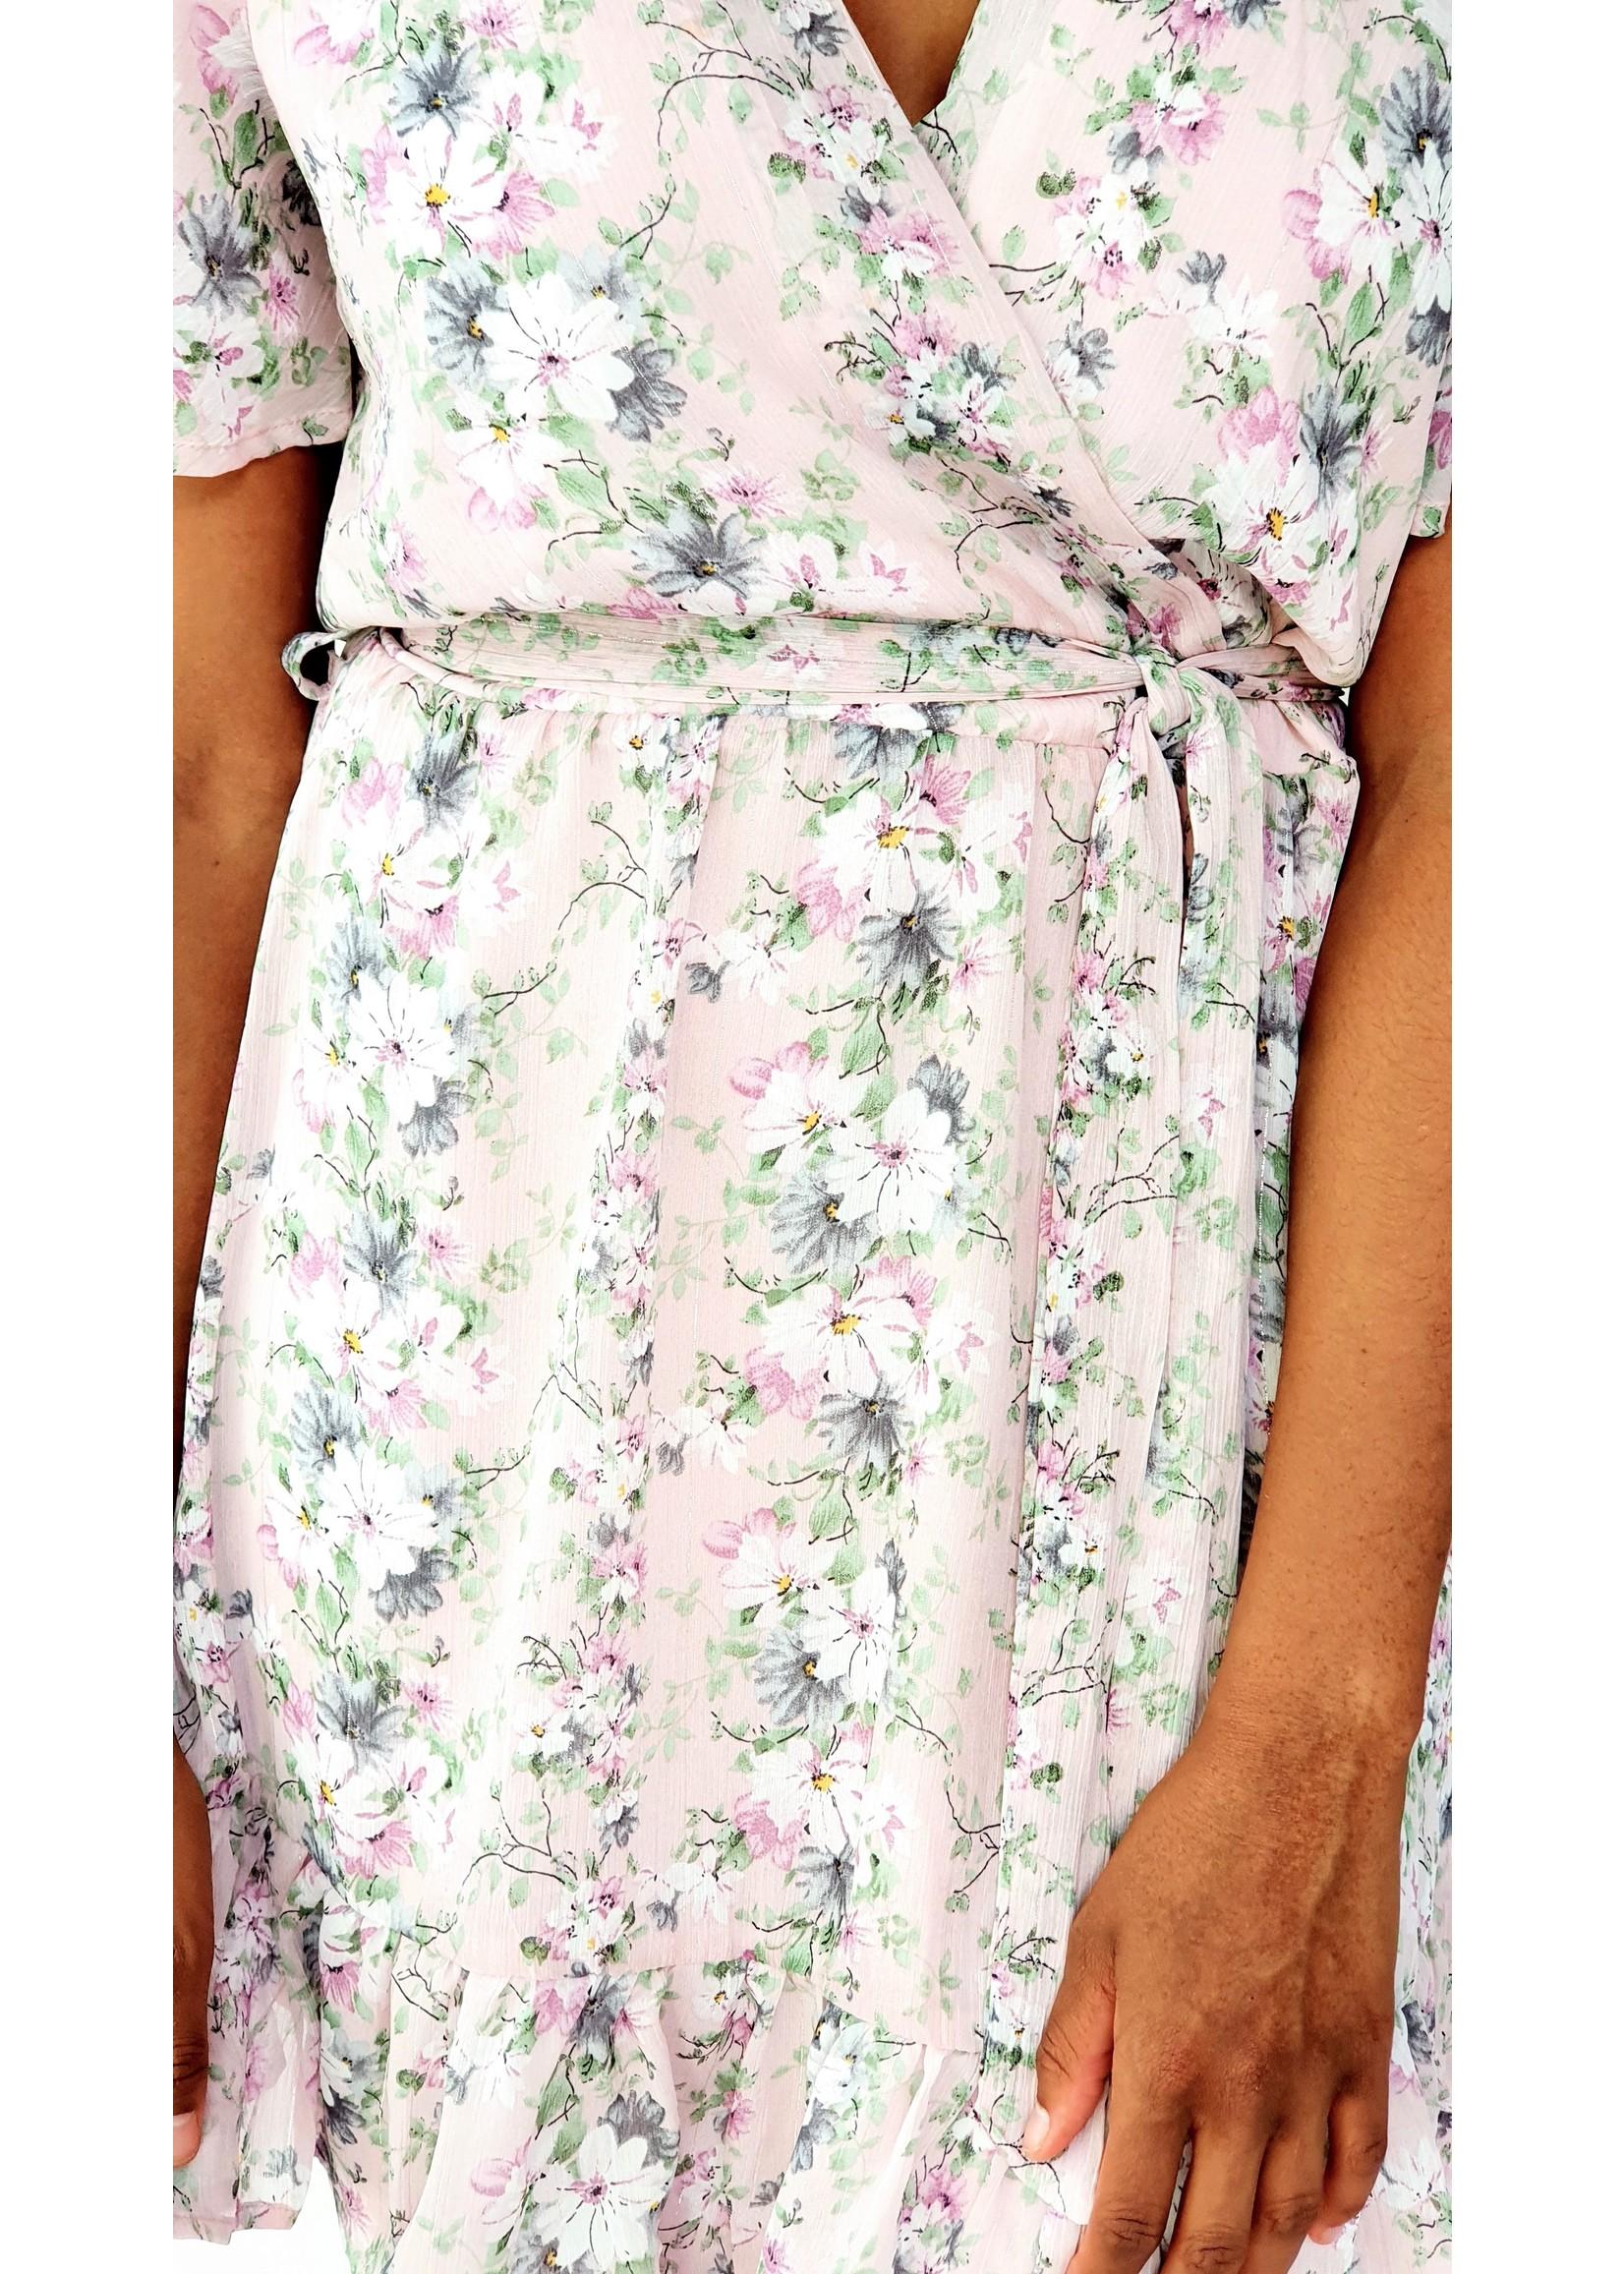 Thé sweet sweet pink dress